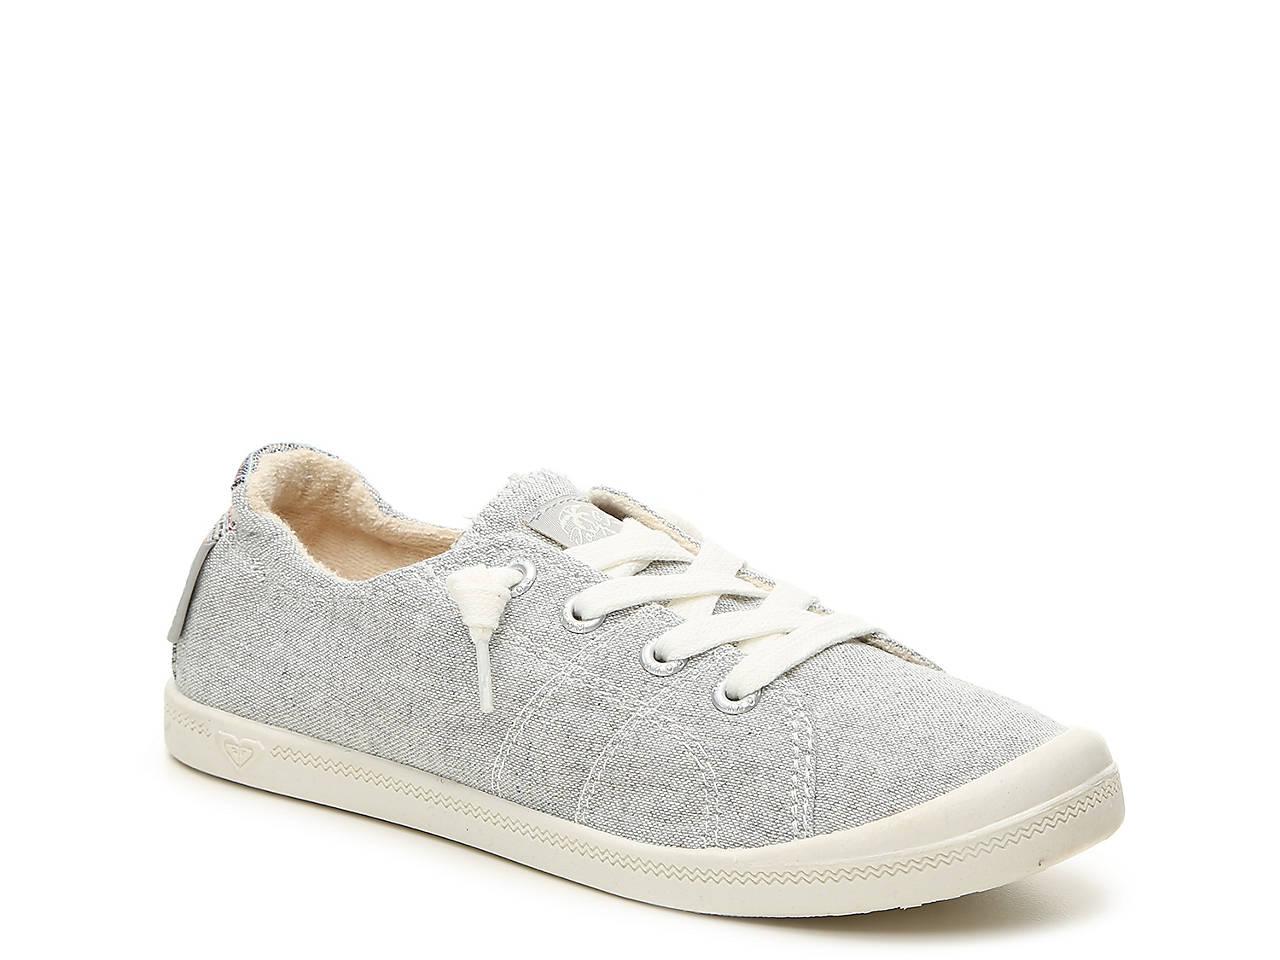 7ef950cc4464 Roxy Bayshore II Sneaker Women s Shoes